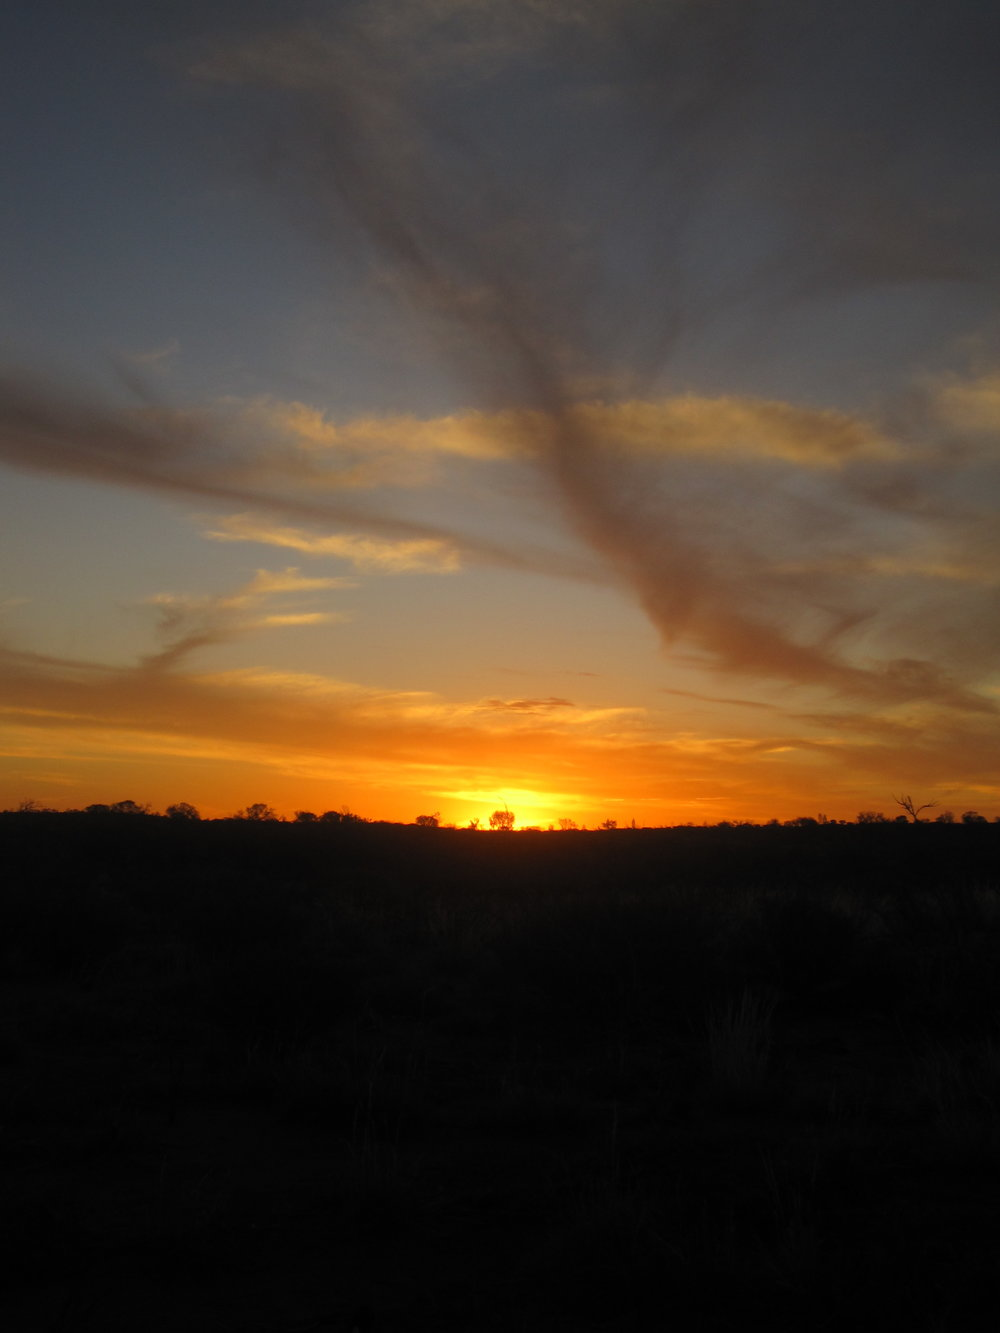 sunset-wisp.jpg